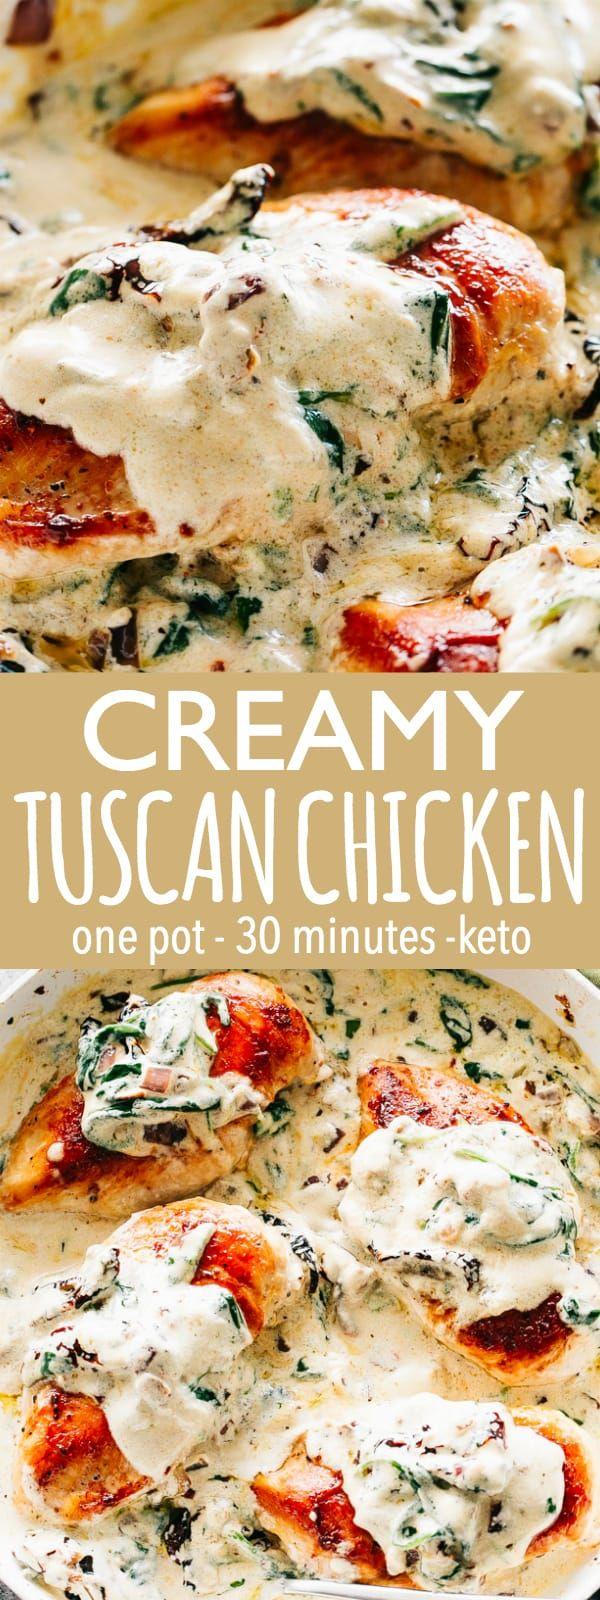 Creamy Tuscan Chicken | Easy Chicken Breasts Recipe & Dinner Idea